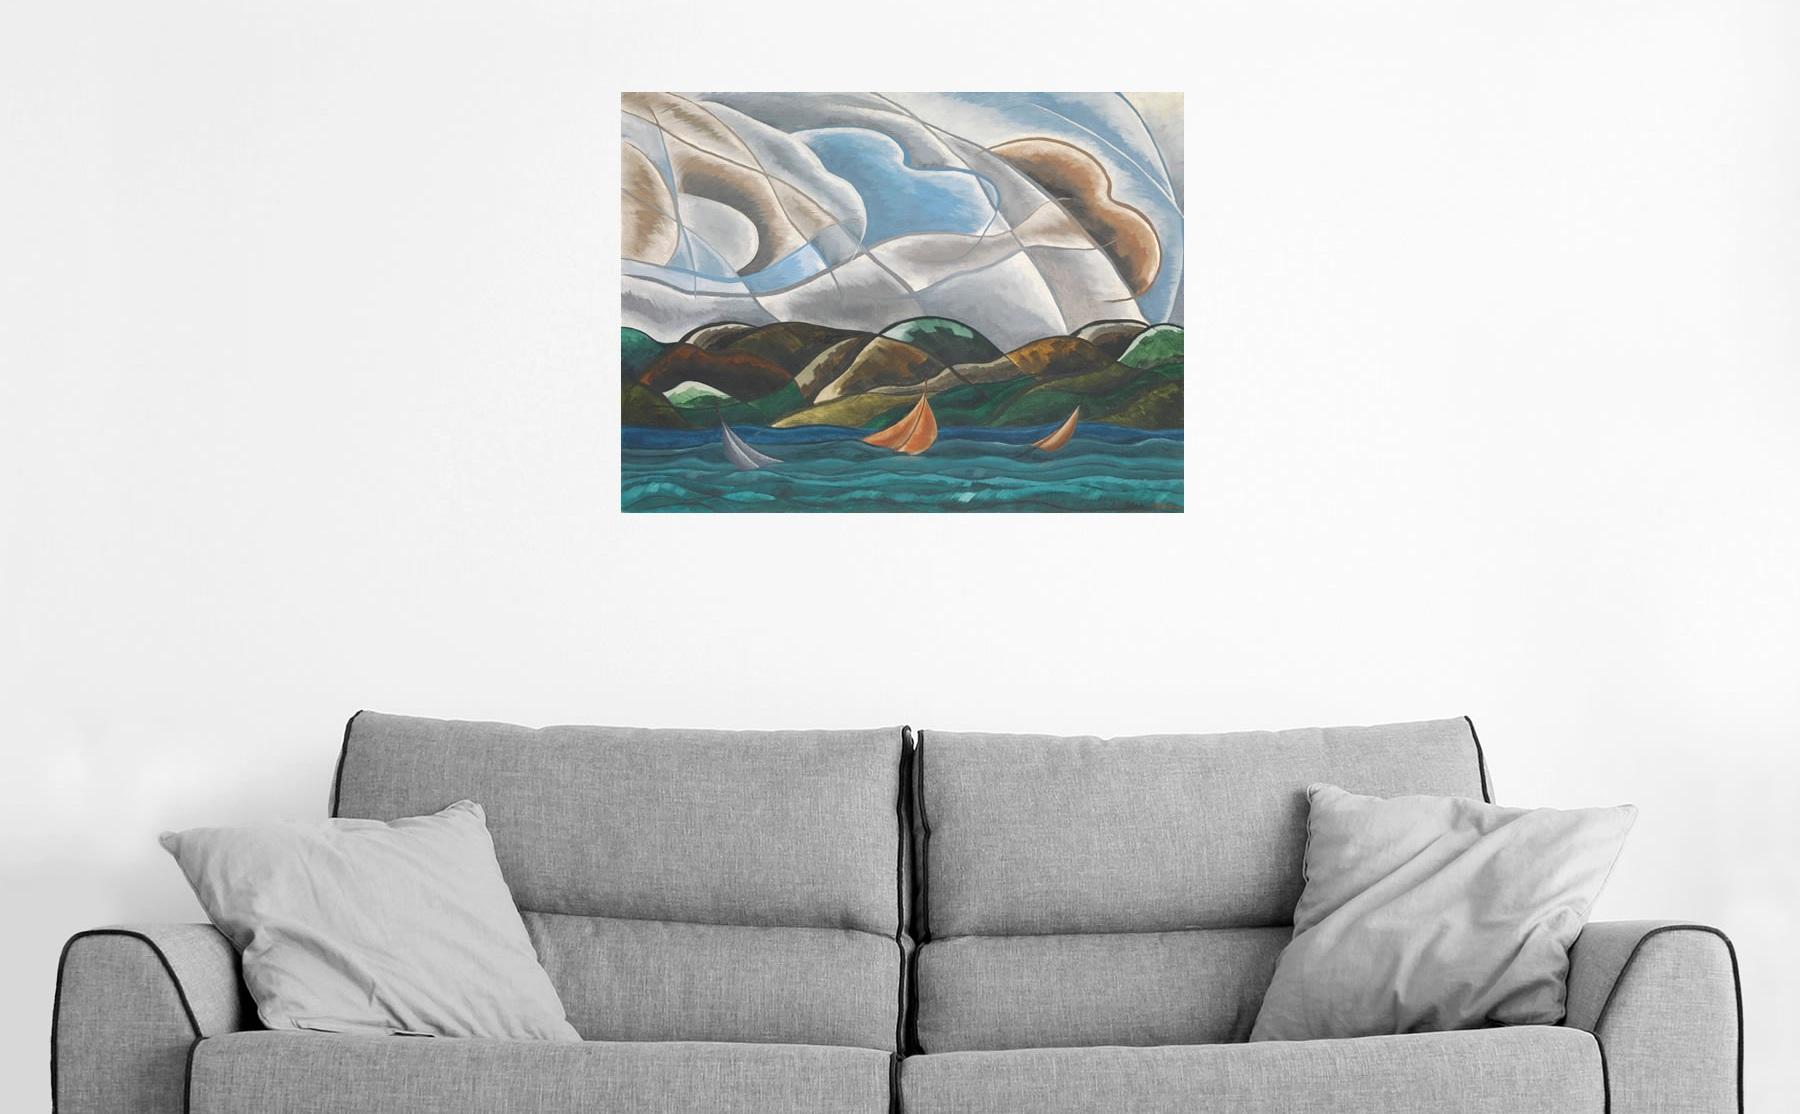 clouds_18x24-poster.jpg